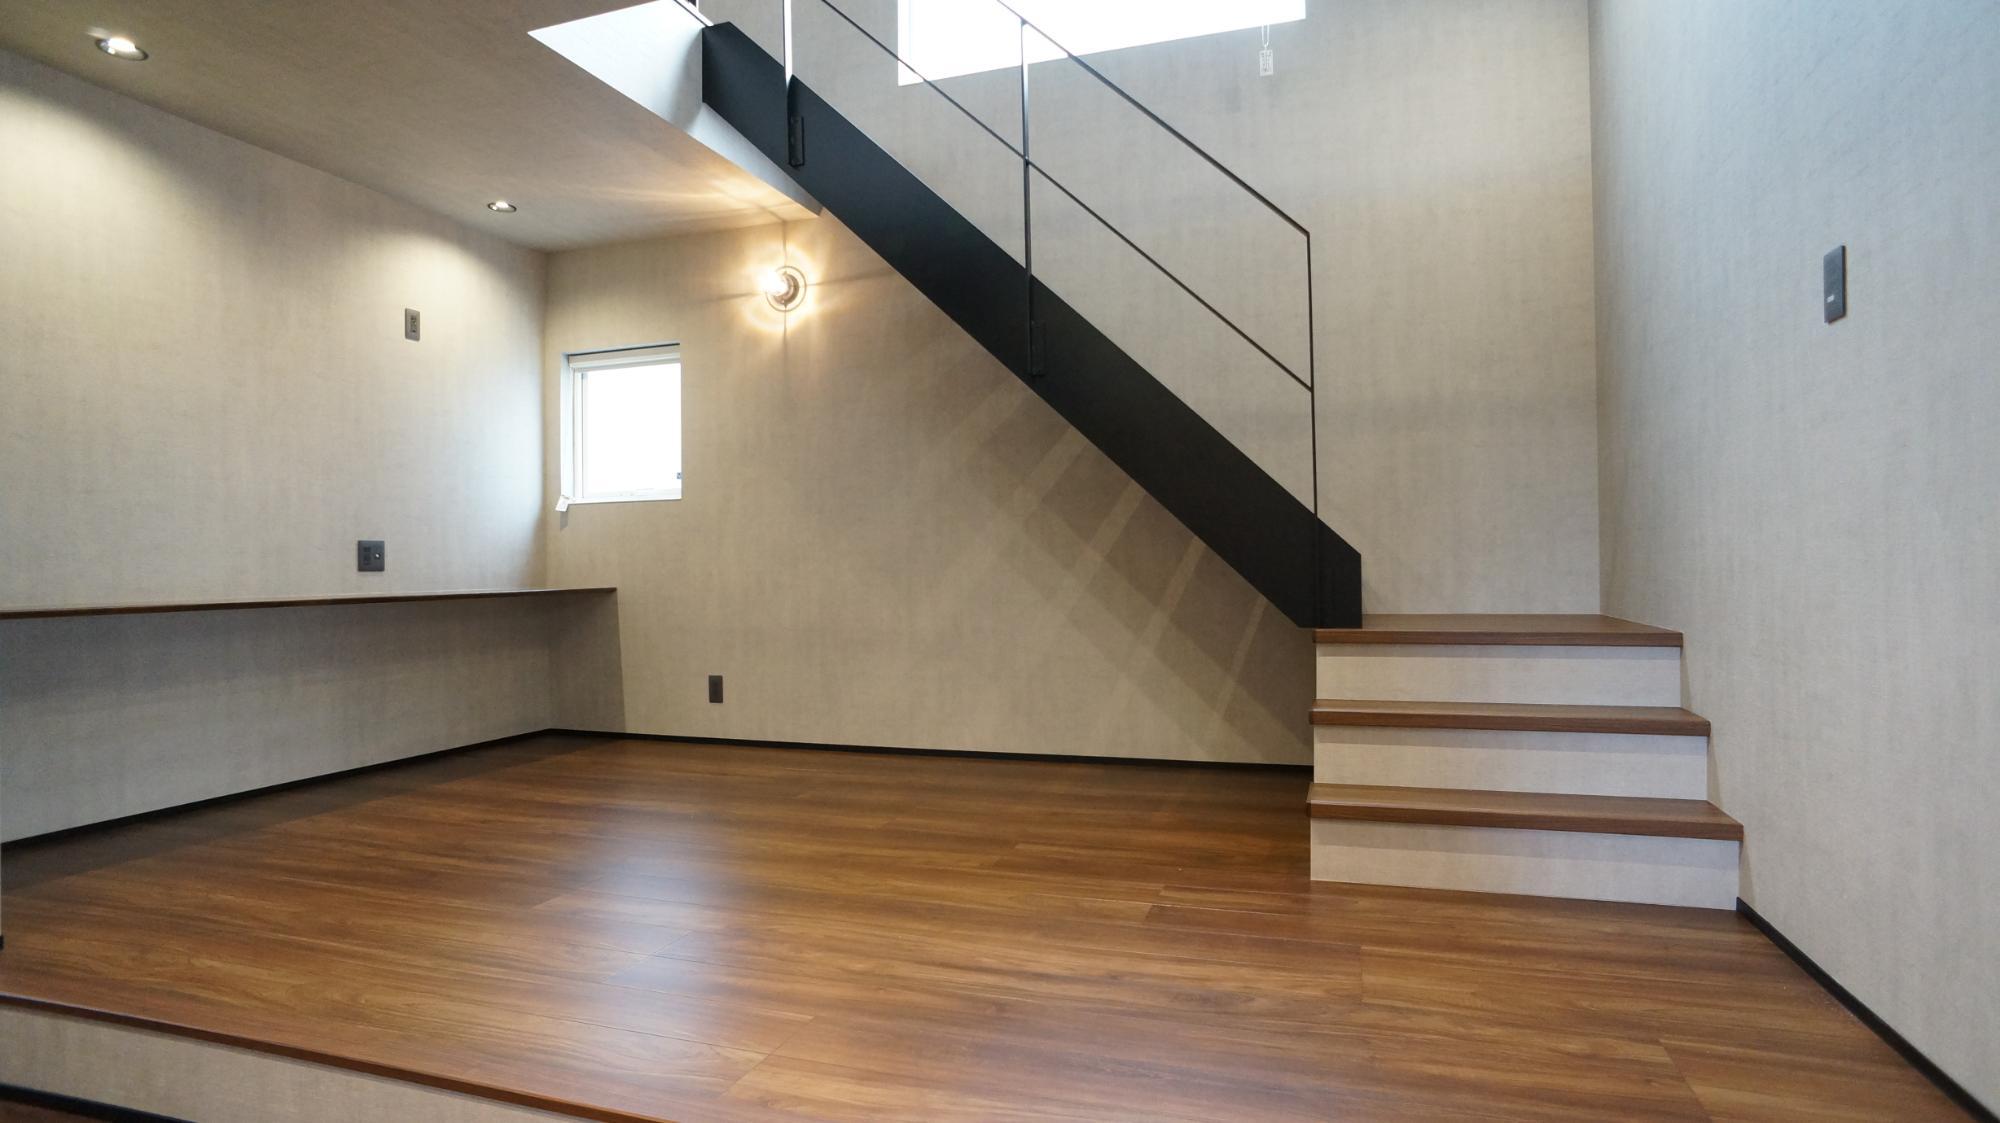 H.FACTORY/株式会社 橋本技建「吹き抜けのあるインダストリアルの家」のリビング・ダイニングの実例写真